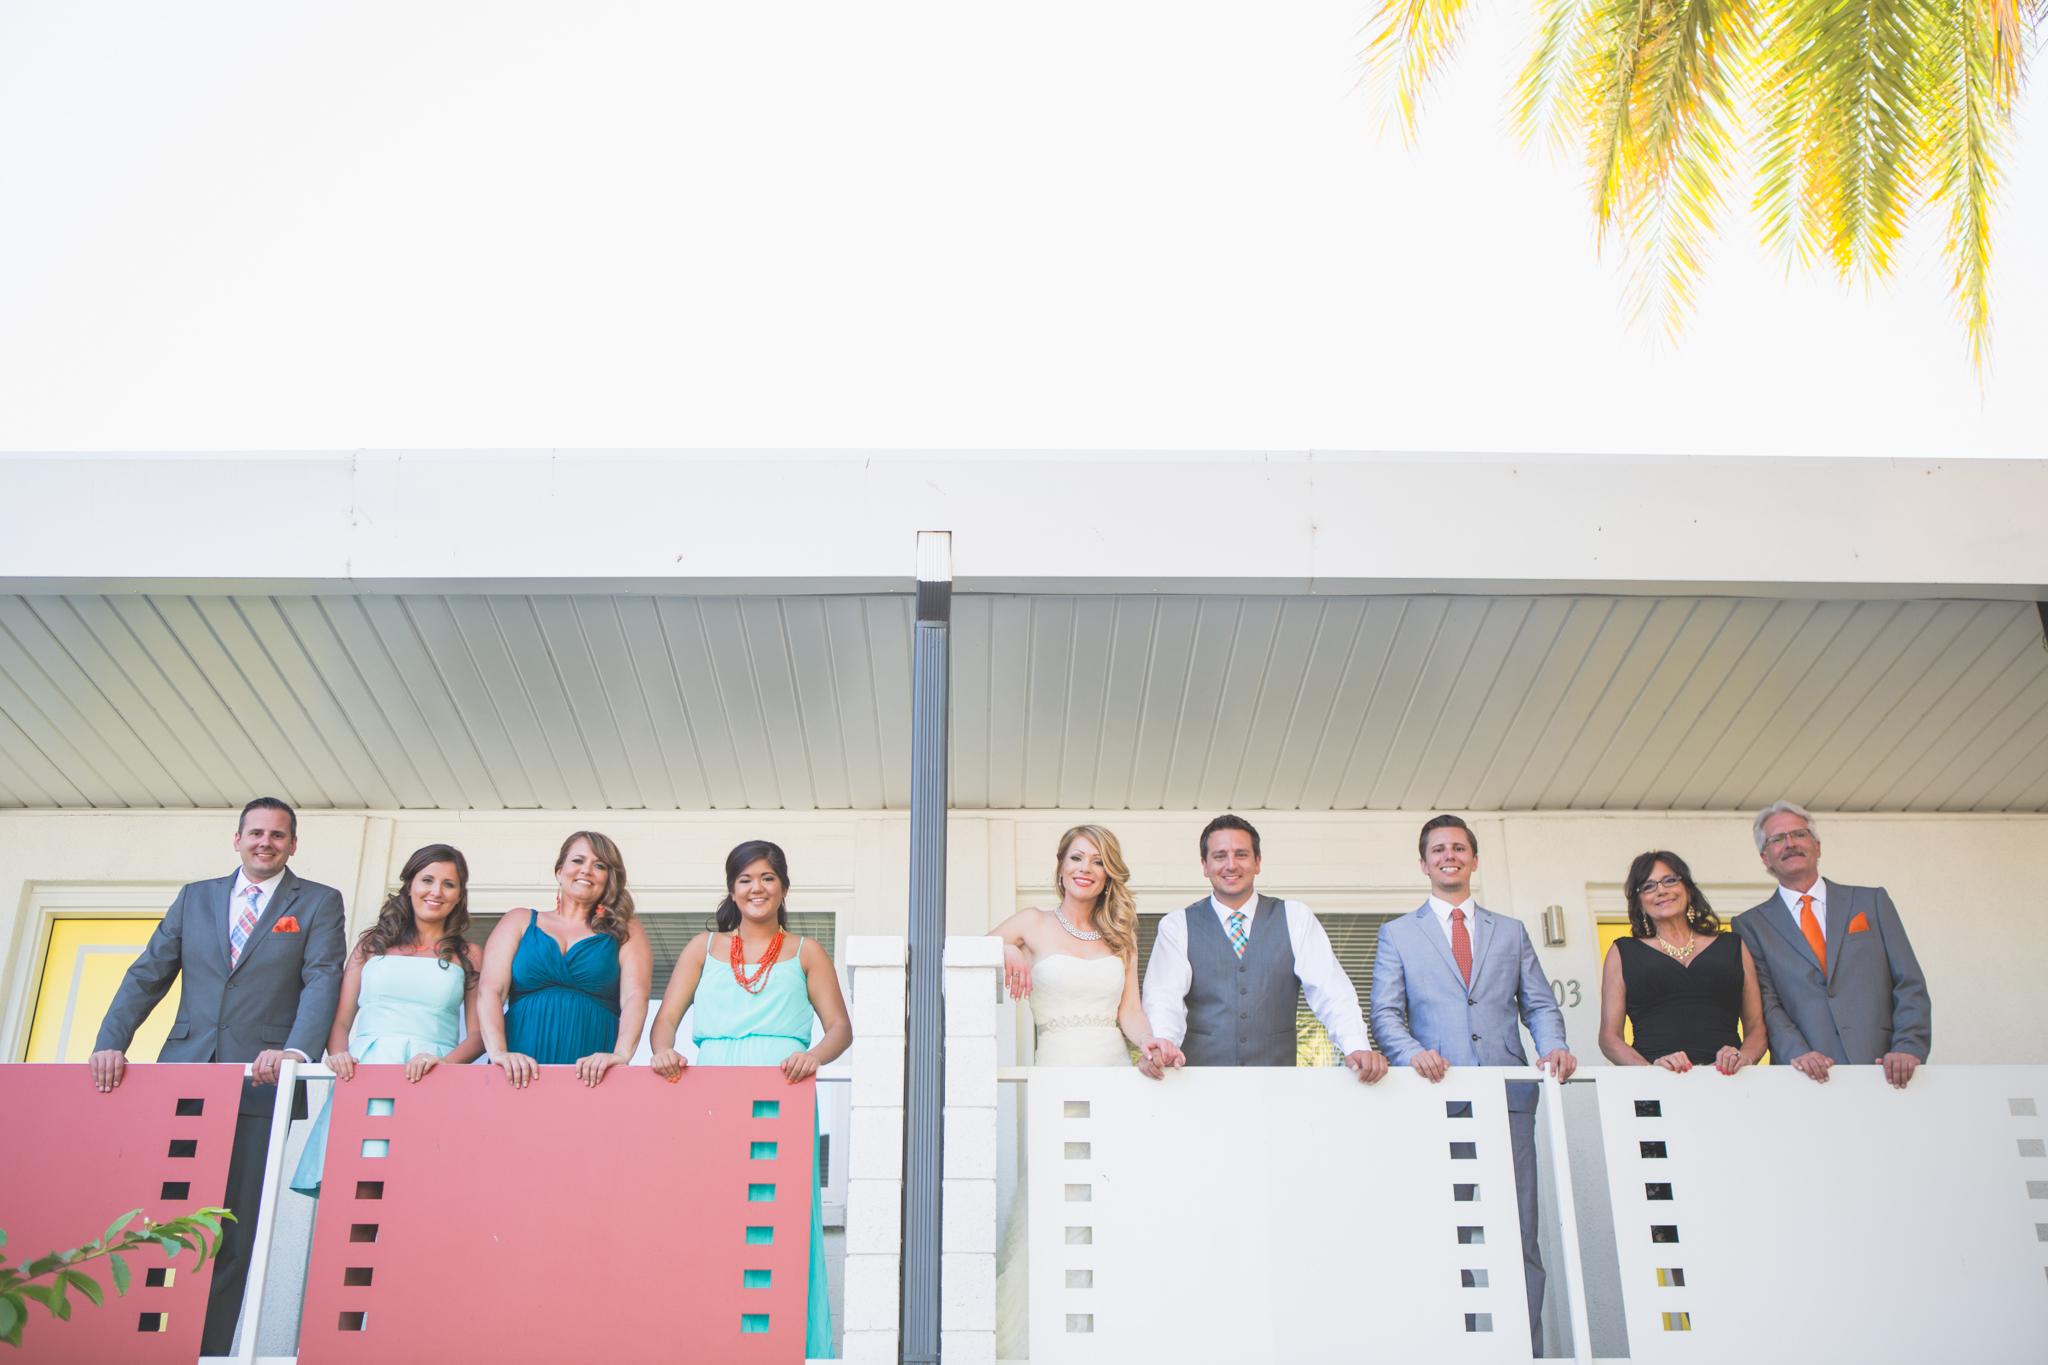 scottsdale-wedding-photographer-el-dorado-bride-groom-family-cool-framing